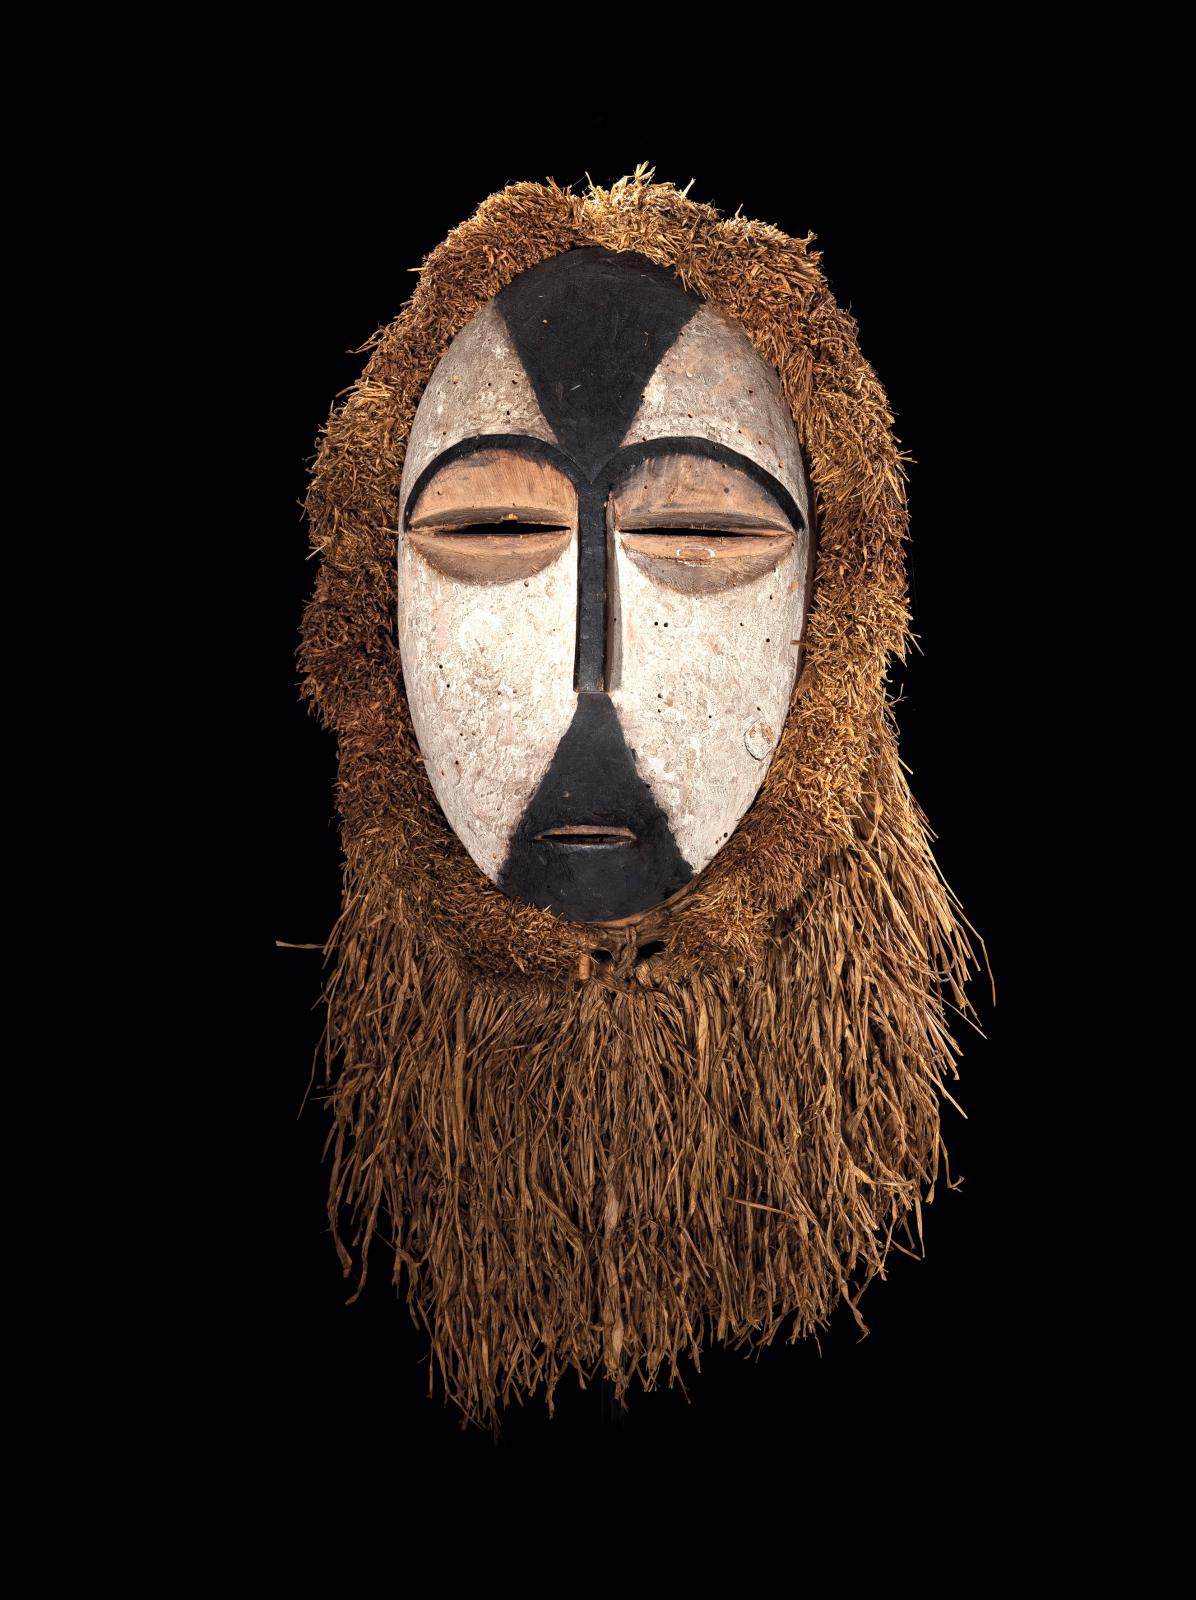 Gabon, 19th century, Galoa People, Okukwe Mask, wood, black and white pigments, raffia, h. 27 cm/10.62 in. Galerie Patrik Fröhlich. Courtesy Galerie Patrik Fröhlich